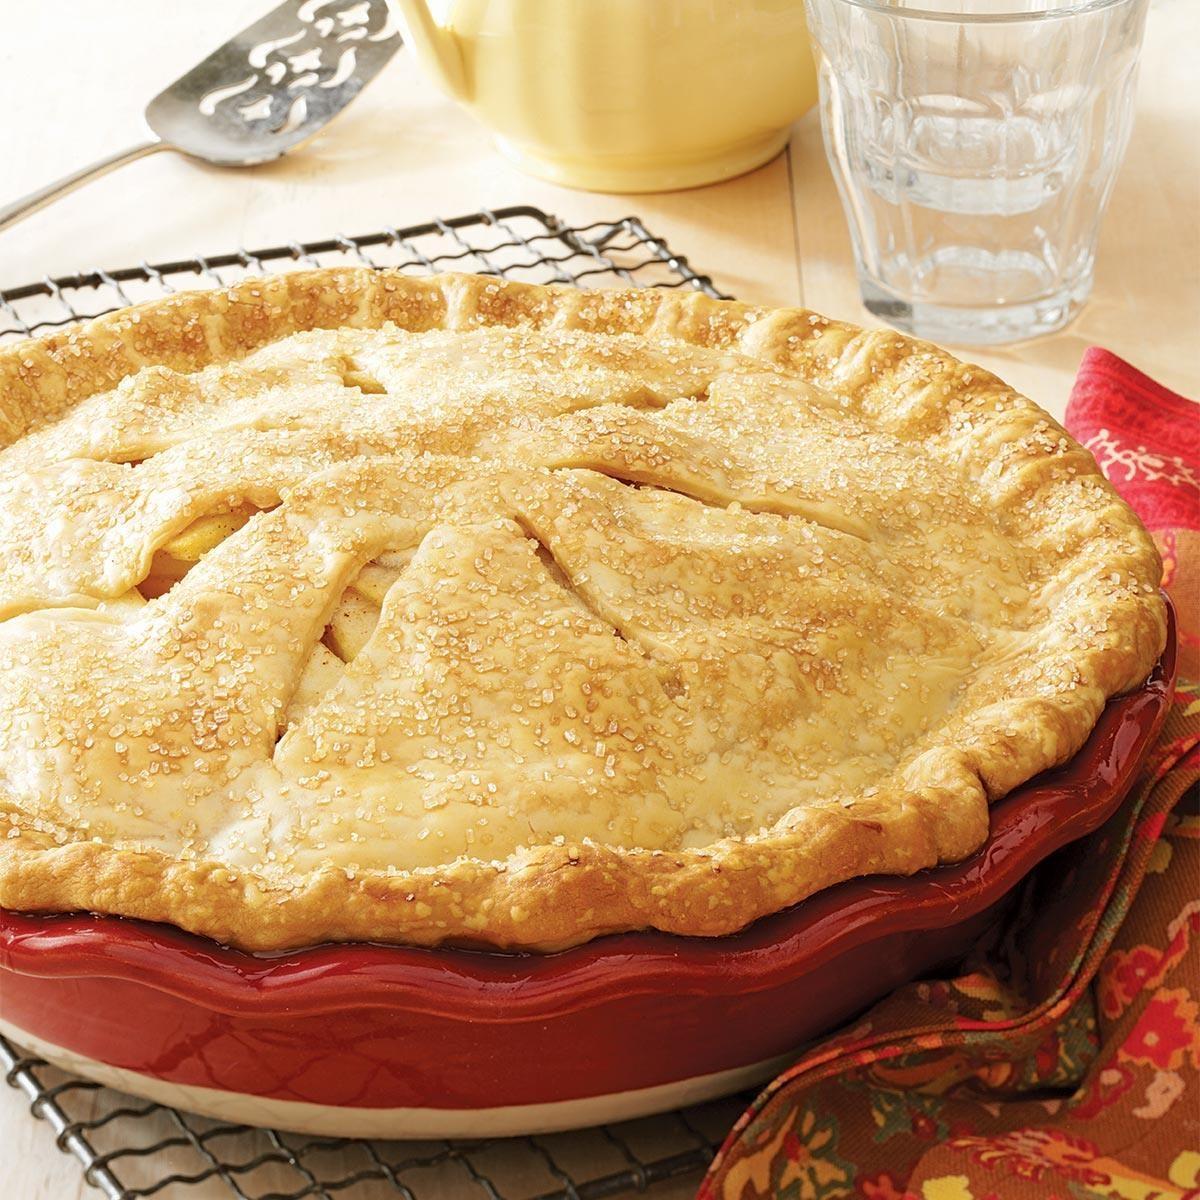 apple pear pie recipe taste of home. Black Bedroom Furniture Sets. Home Design Ideas